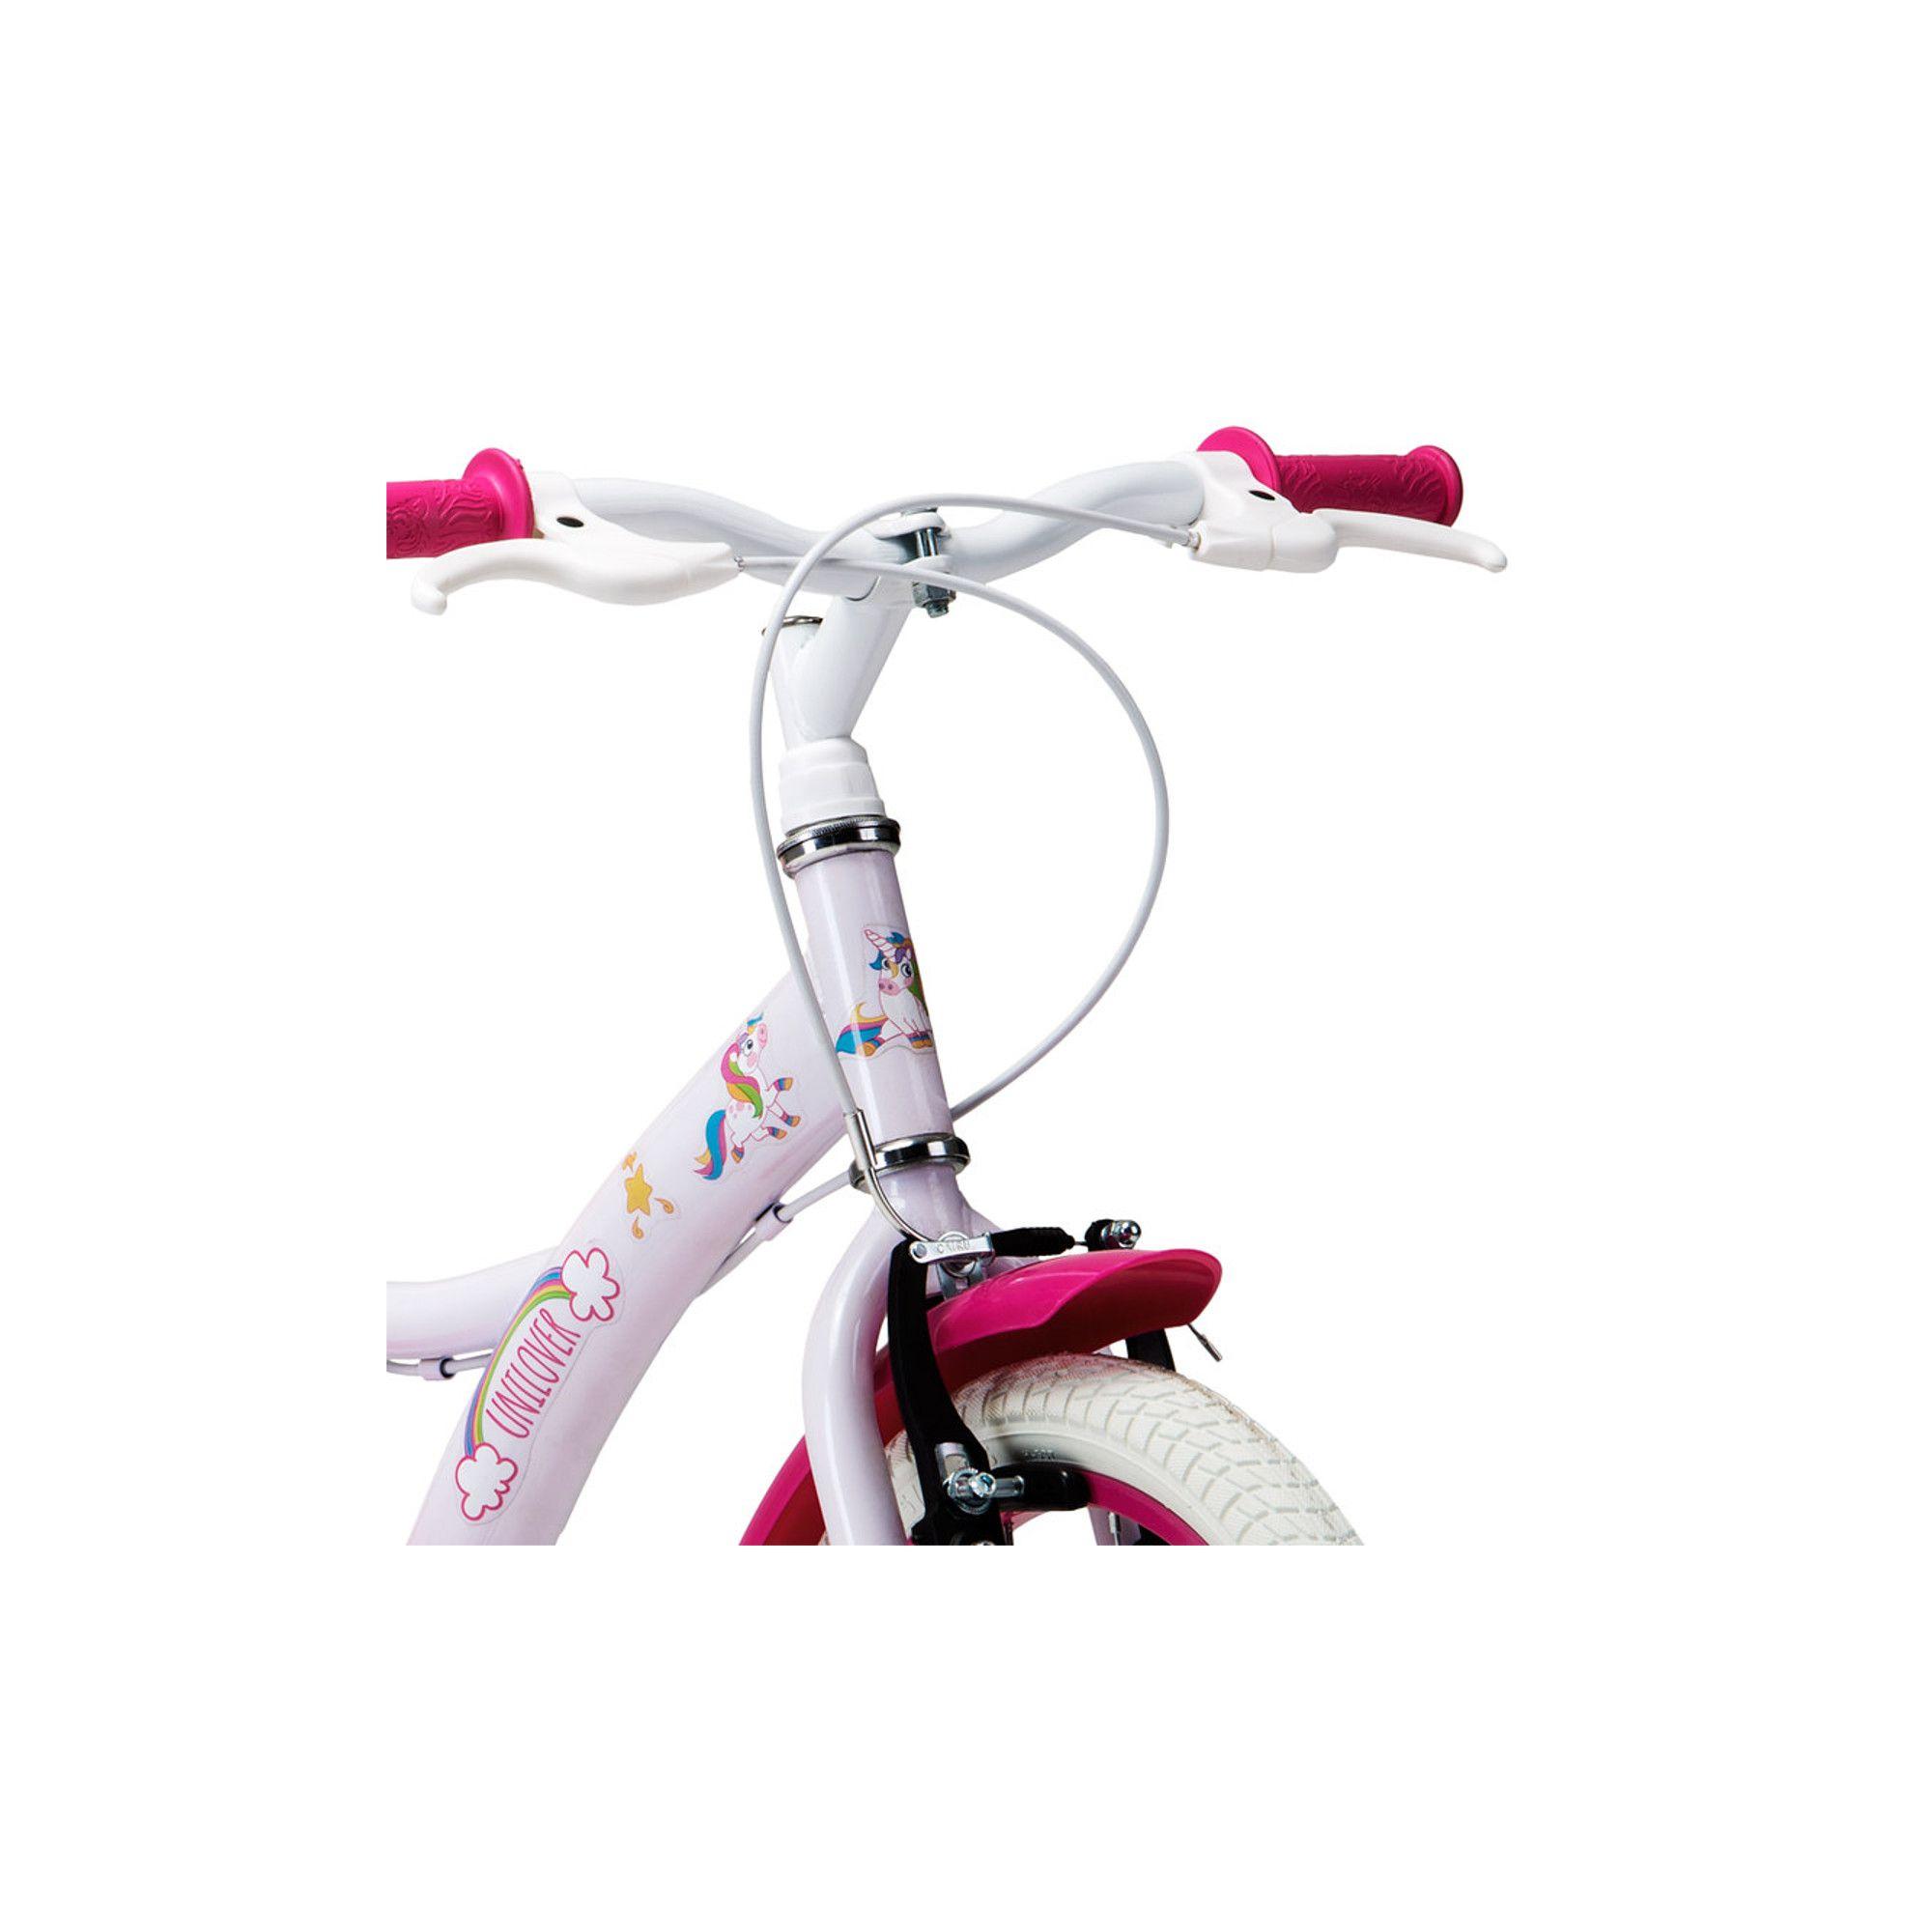 Bicicleta Infantil Groove Unilover aro 16 2020